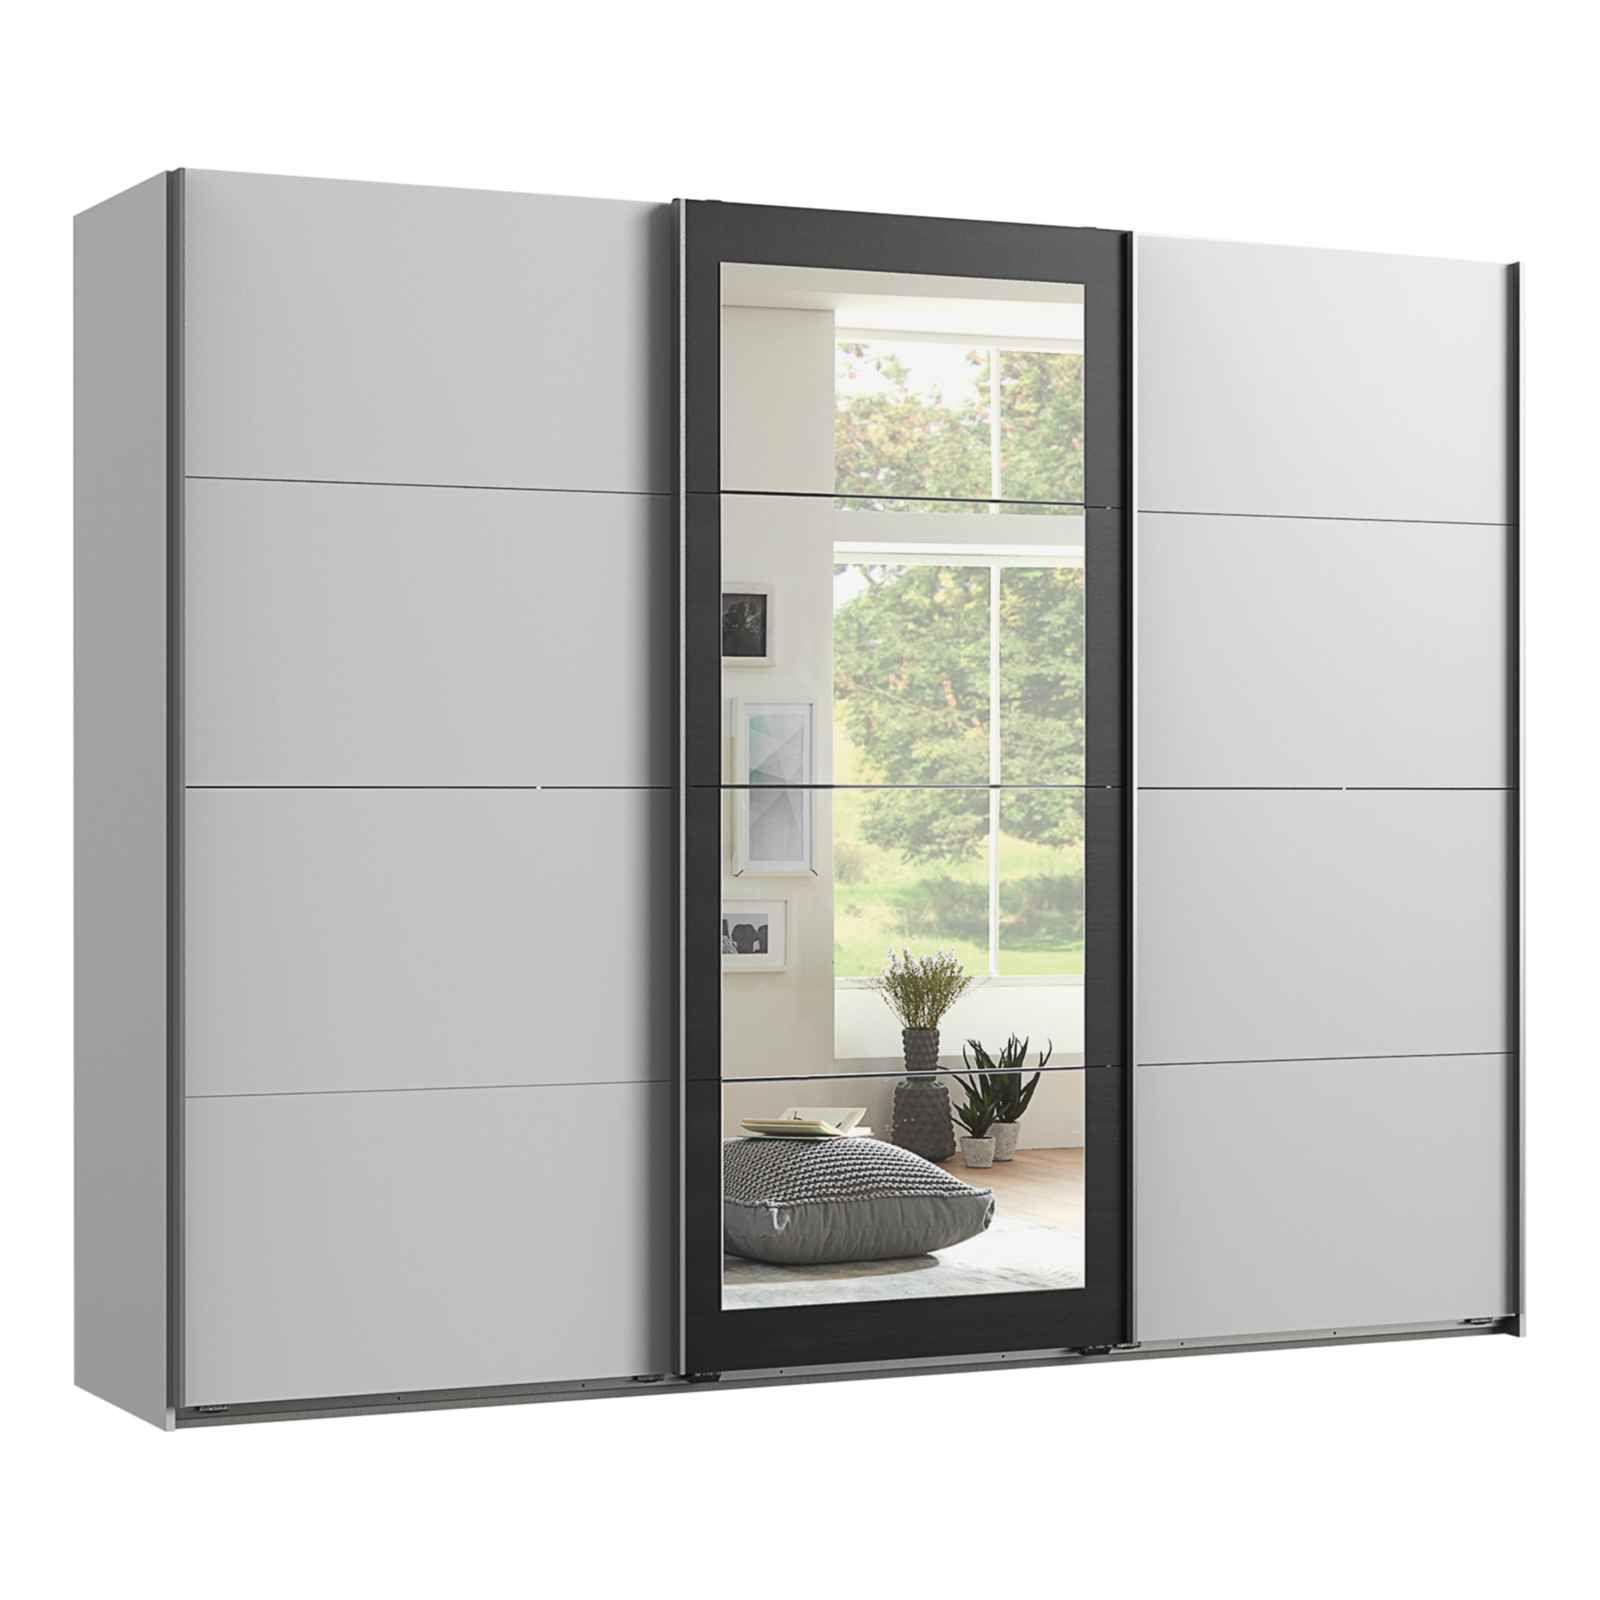 armoire a portes coulissantes minden decor blanc raw steel miroir 3 portes